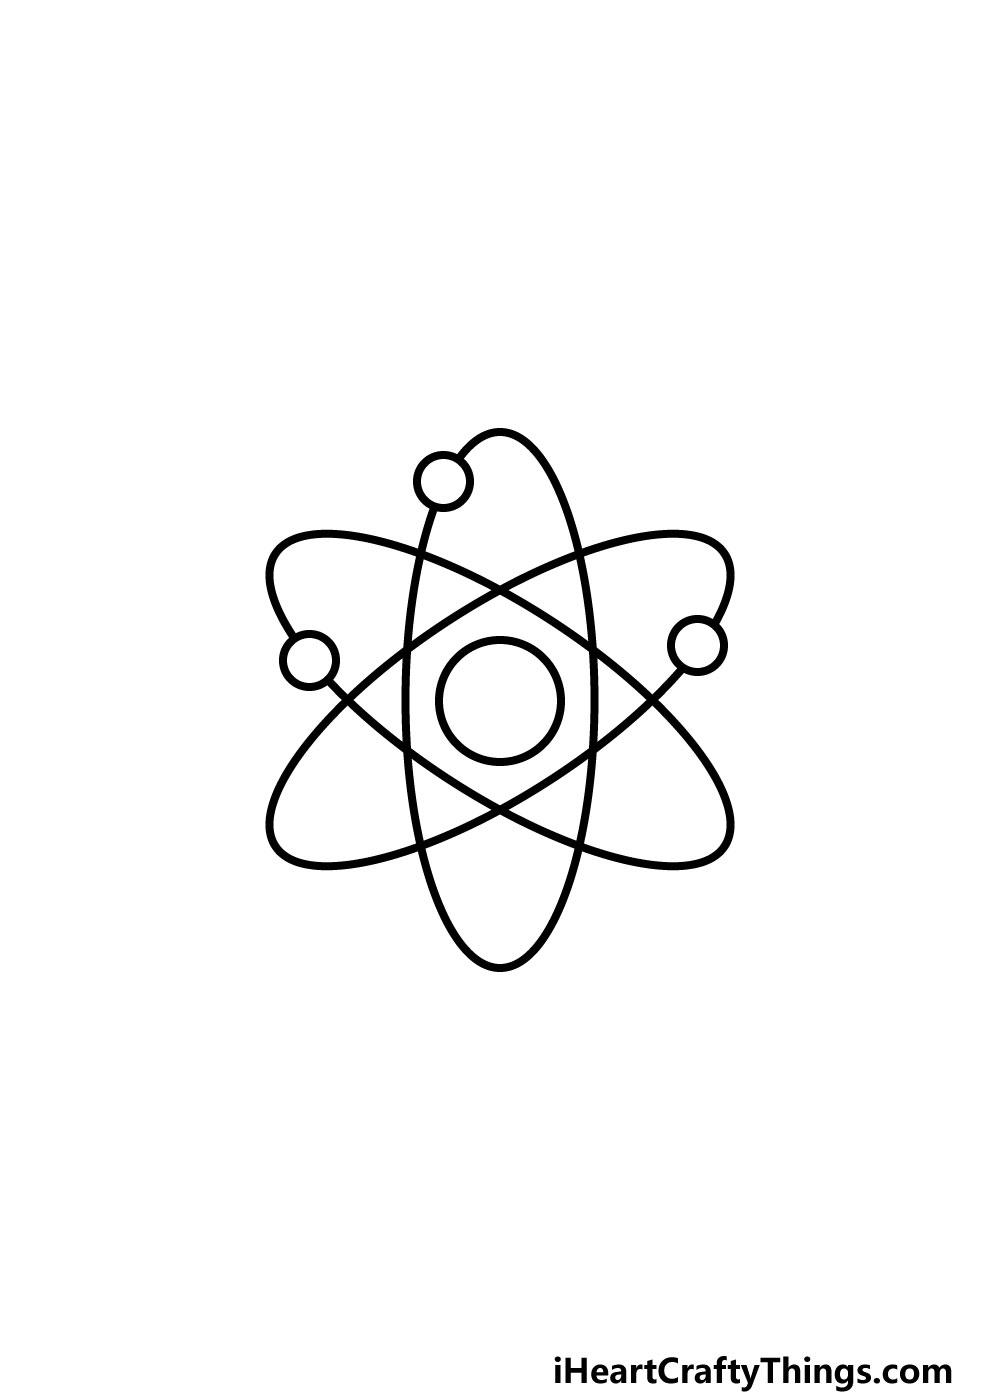 drawing an atom step 5